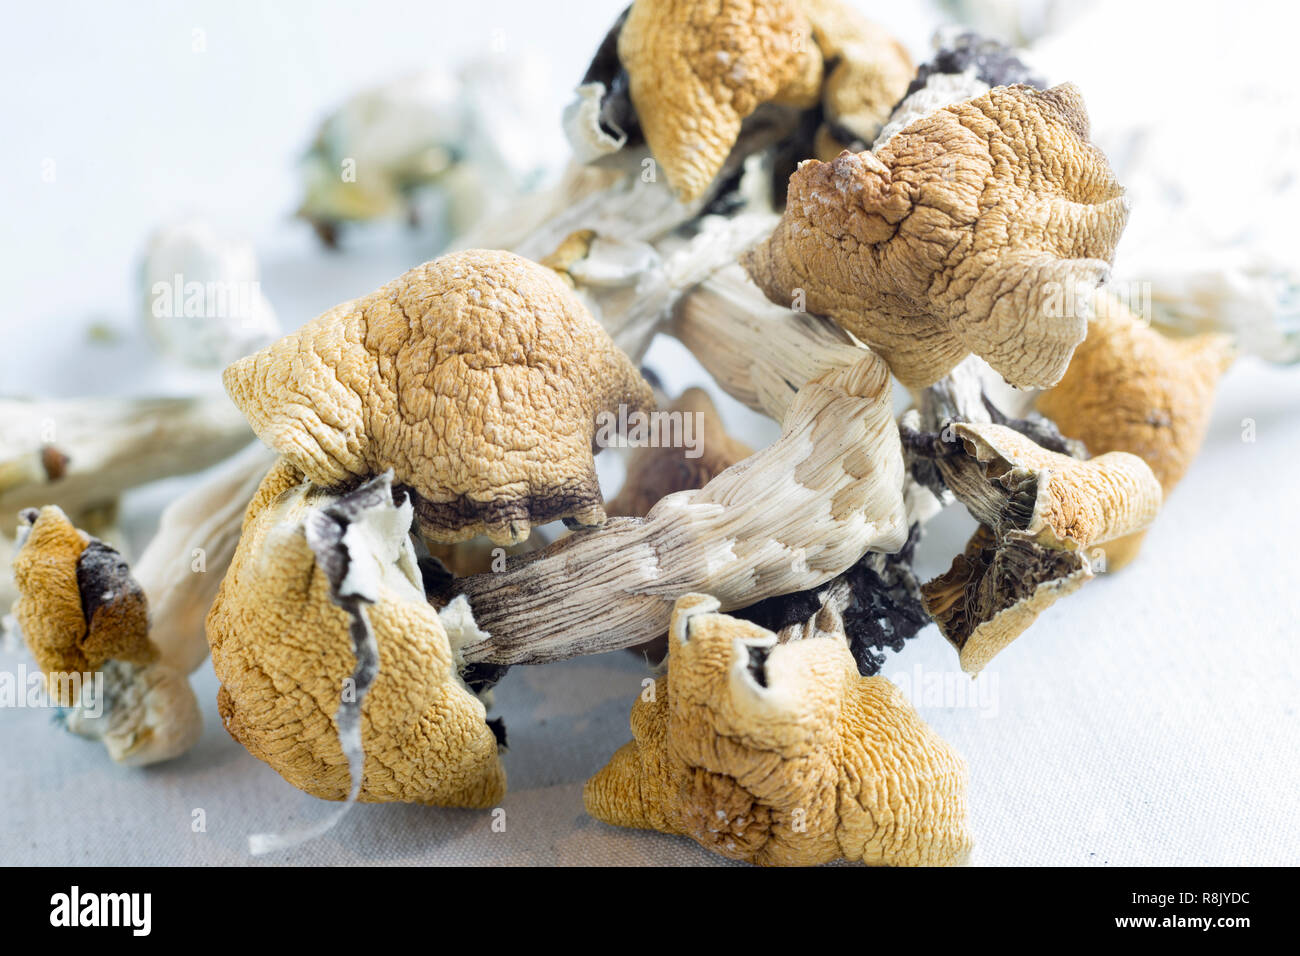 Les champignons magiques, contenant la substance psychoactive la psilocybine Banque D'Images